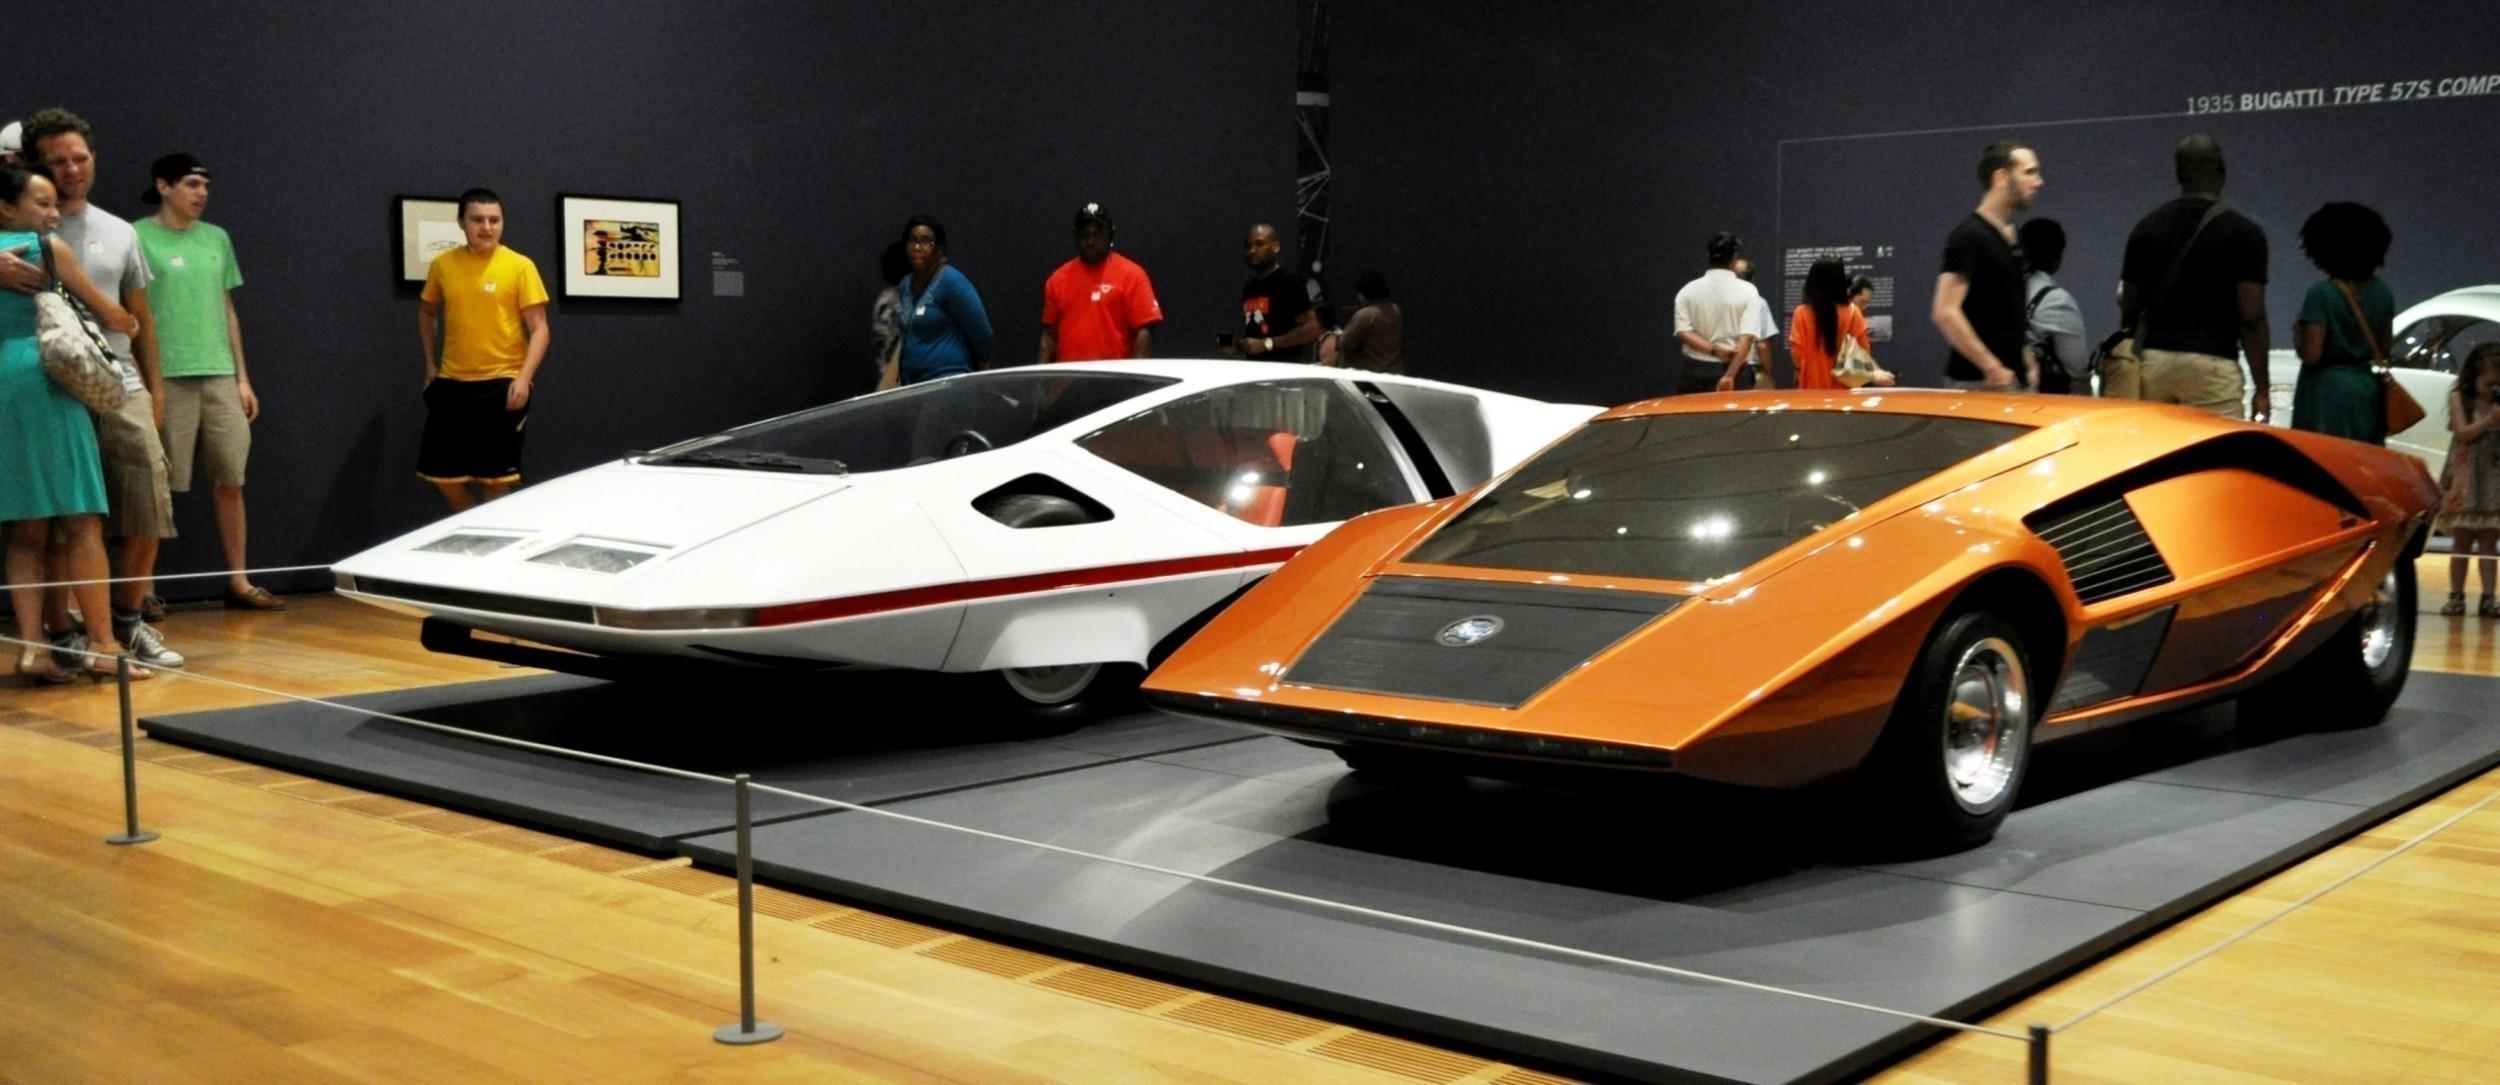 atlanta dream cars showcase 1970 lancia stratos hf zero by bertone. Black Bedroom Furniture Sets. Home Design Ideas